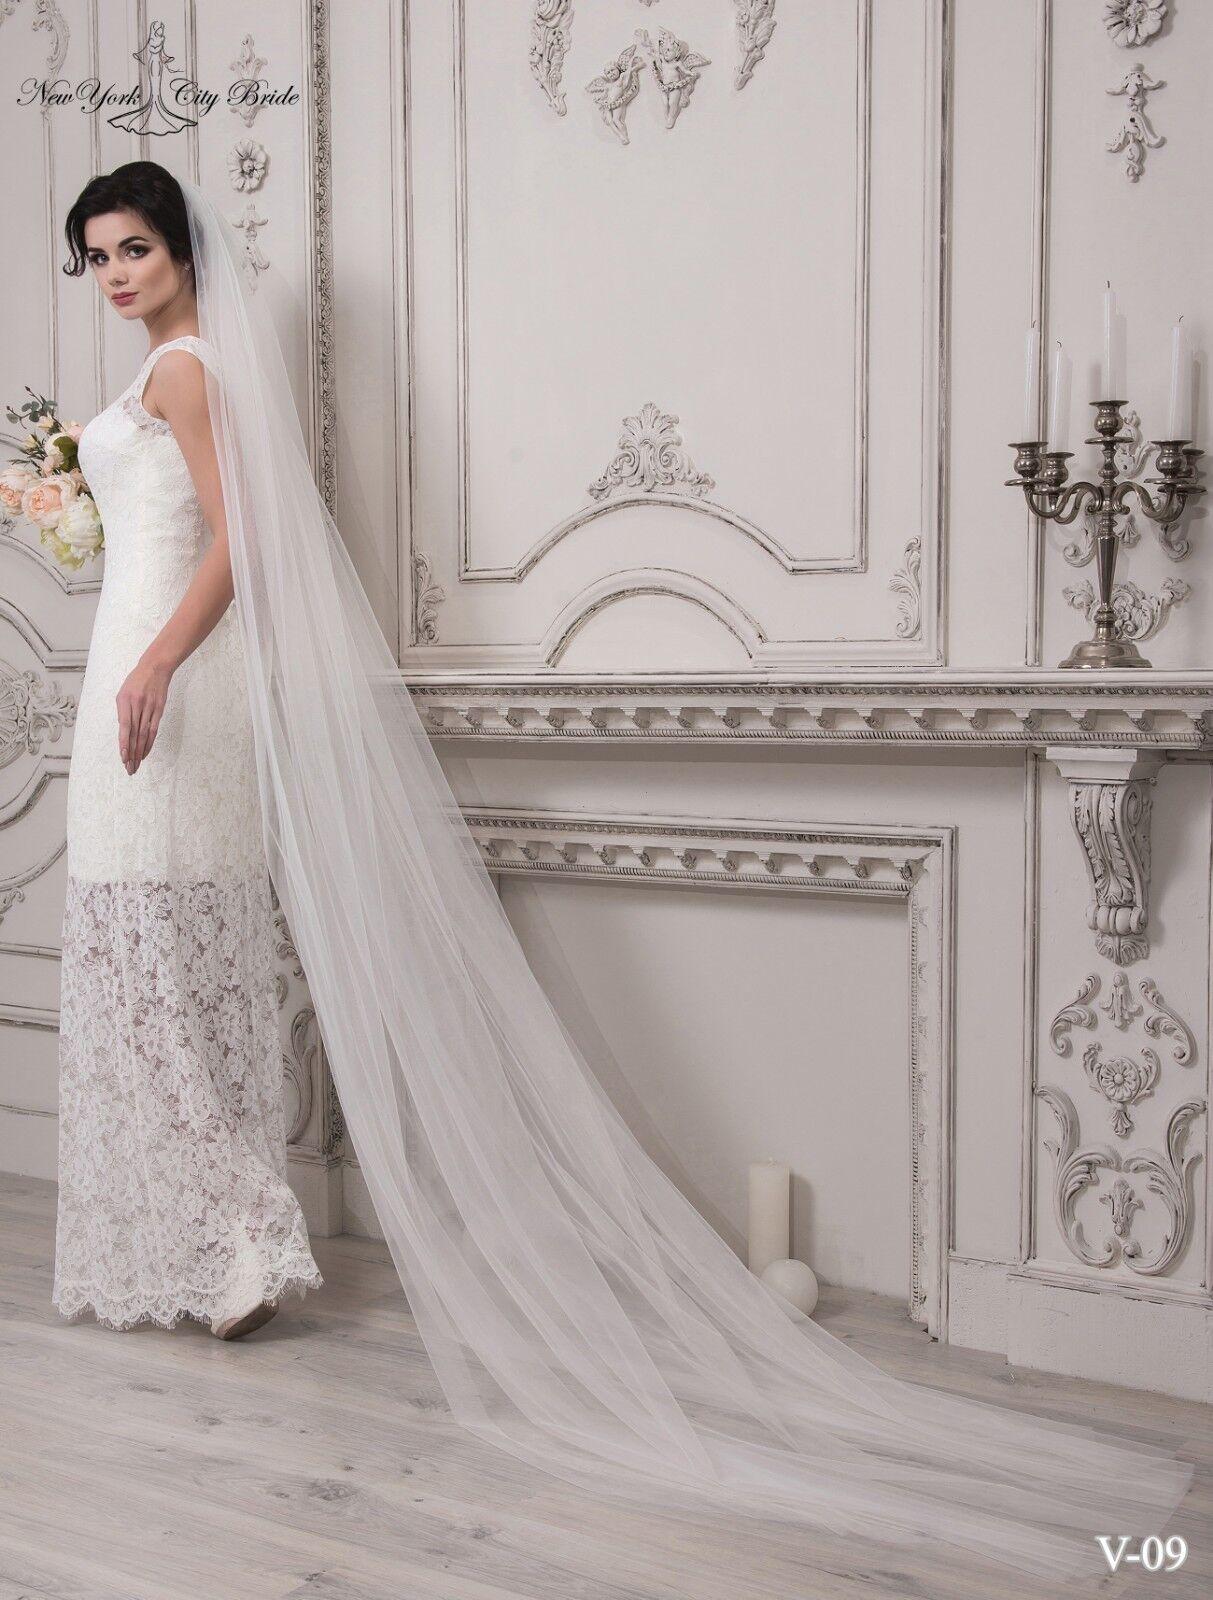 Wedding Veil Monica from NYC Bride,Bridal veil,White veil,Ivory veil,Cathedral